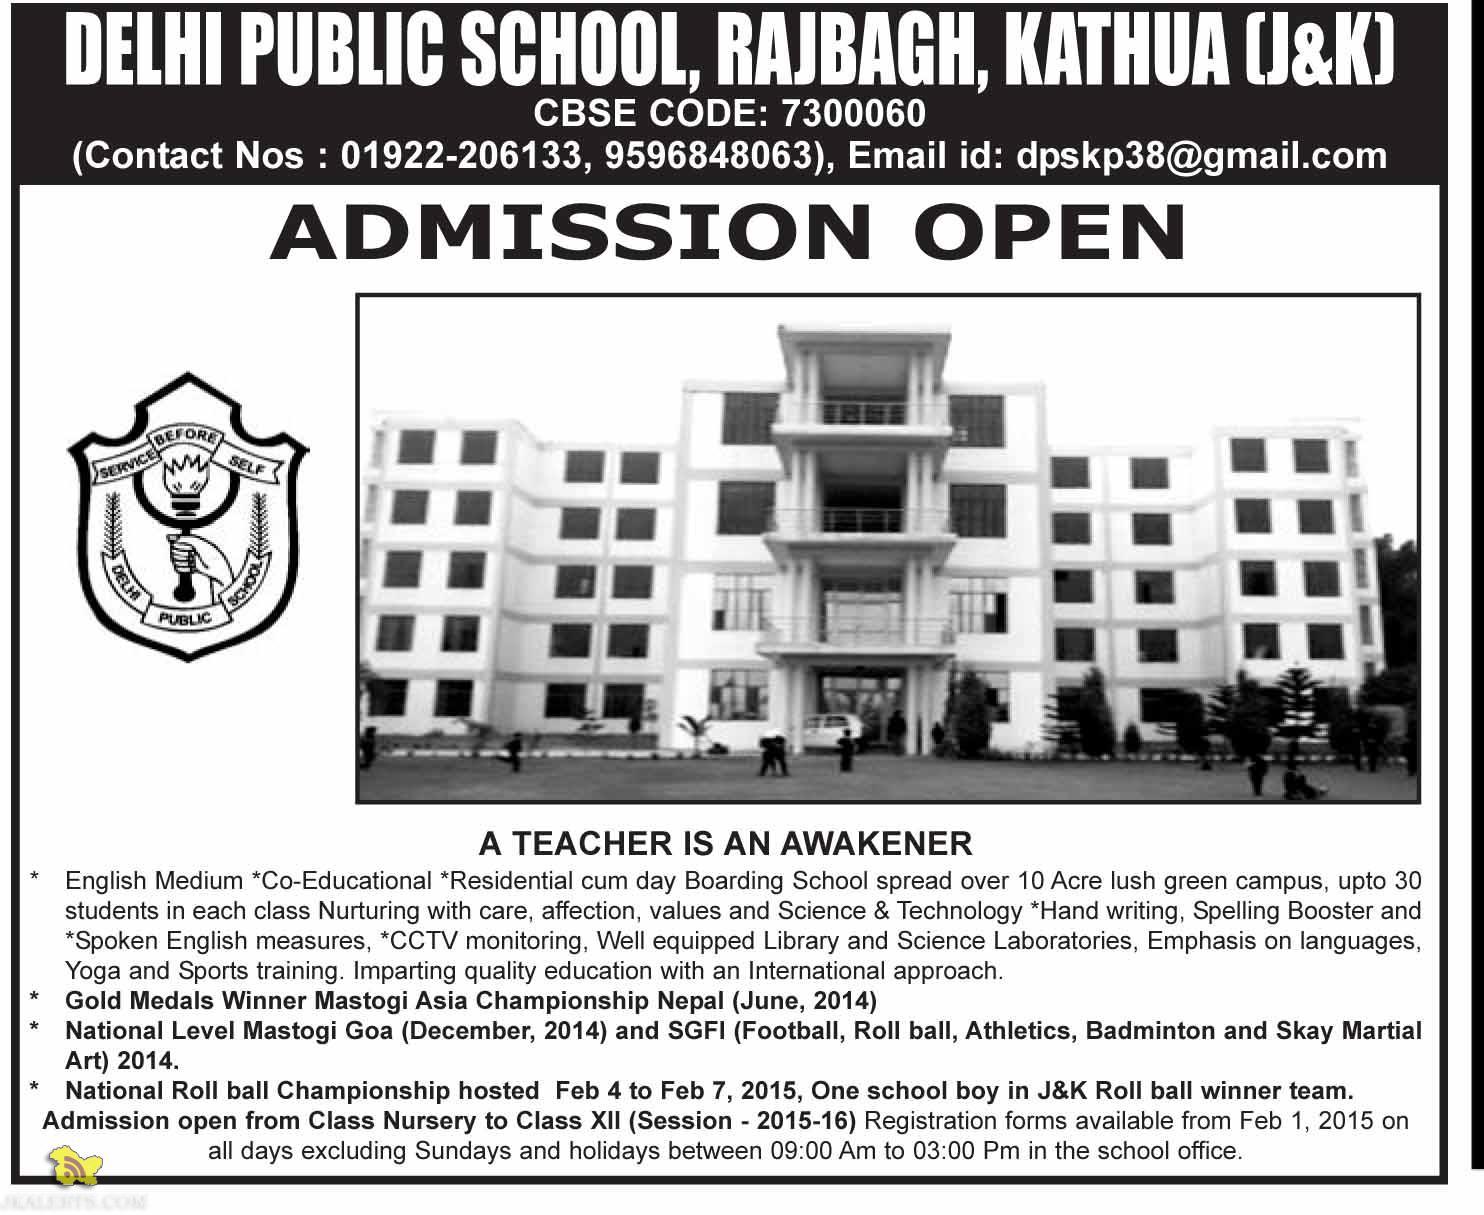 ADMISSION OPEN IN DELHI PUBLIC SCHOOL, RAJBAGH, KATHUA 2015